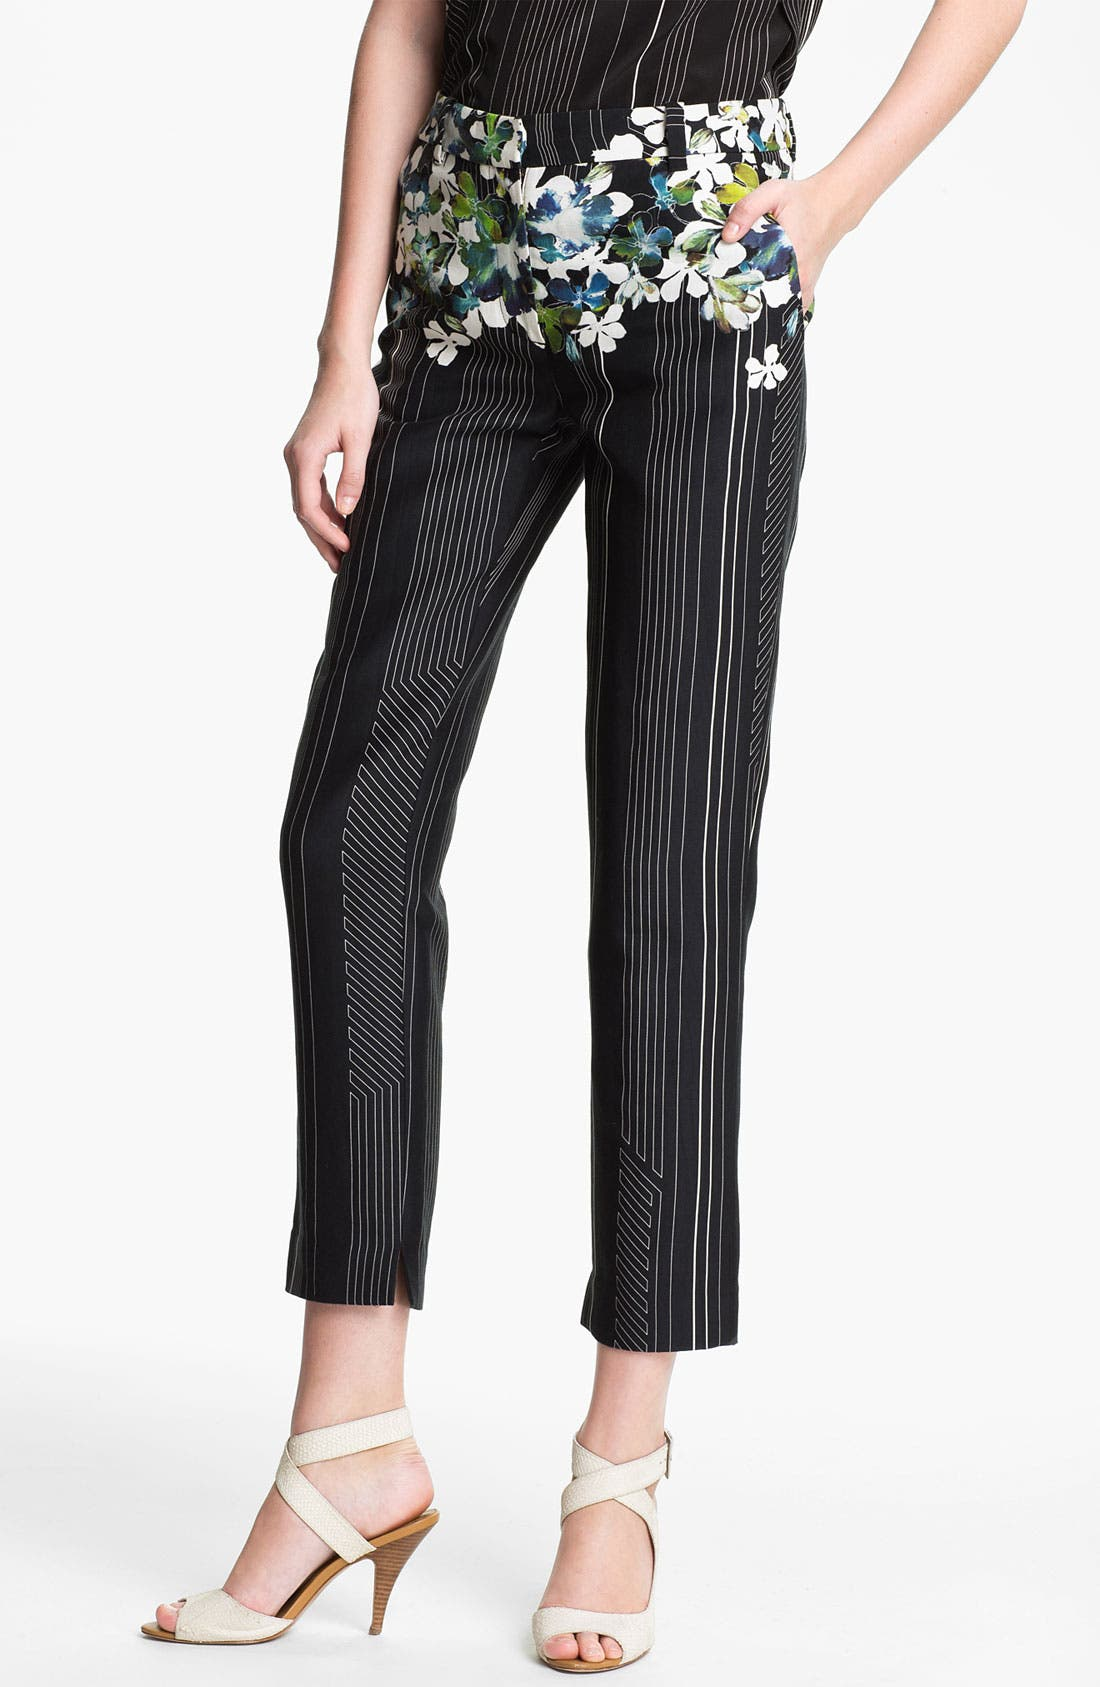 Main Image - 3.1 Phillip Lim Floral Print Flat Front Trousers